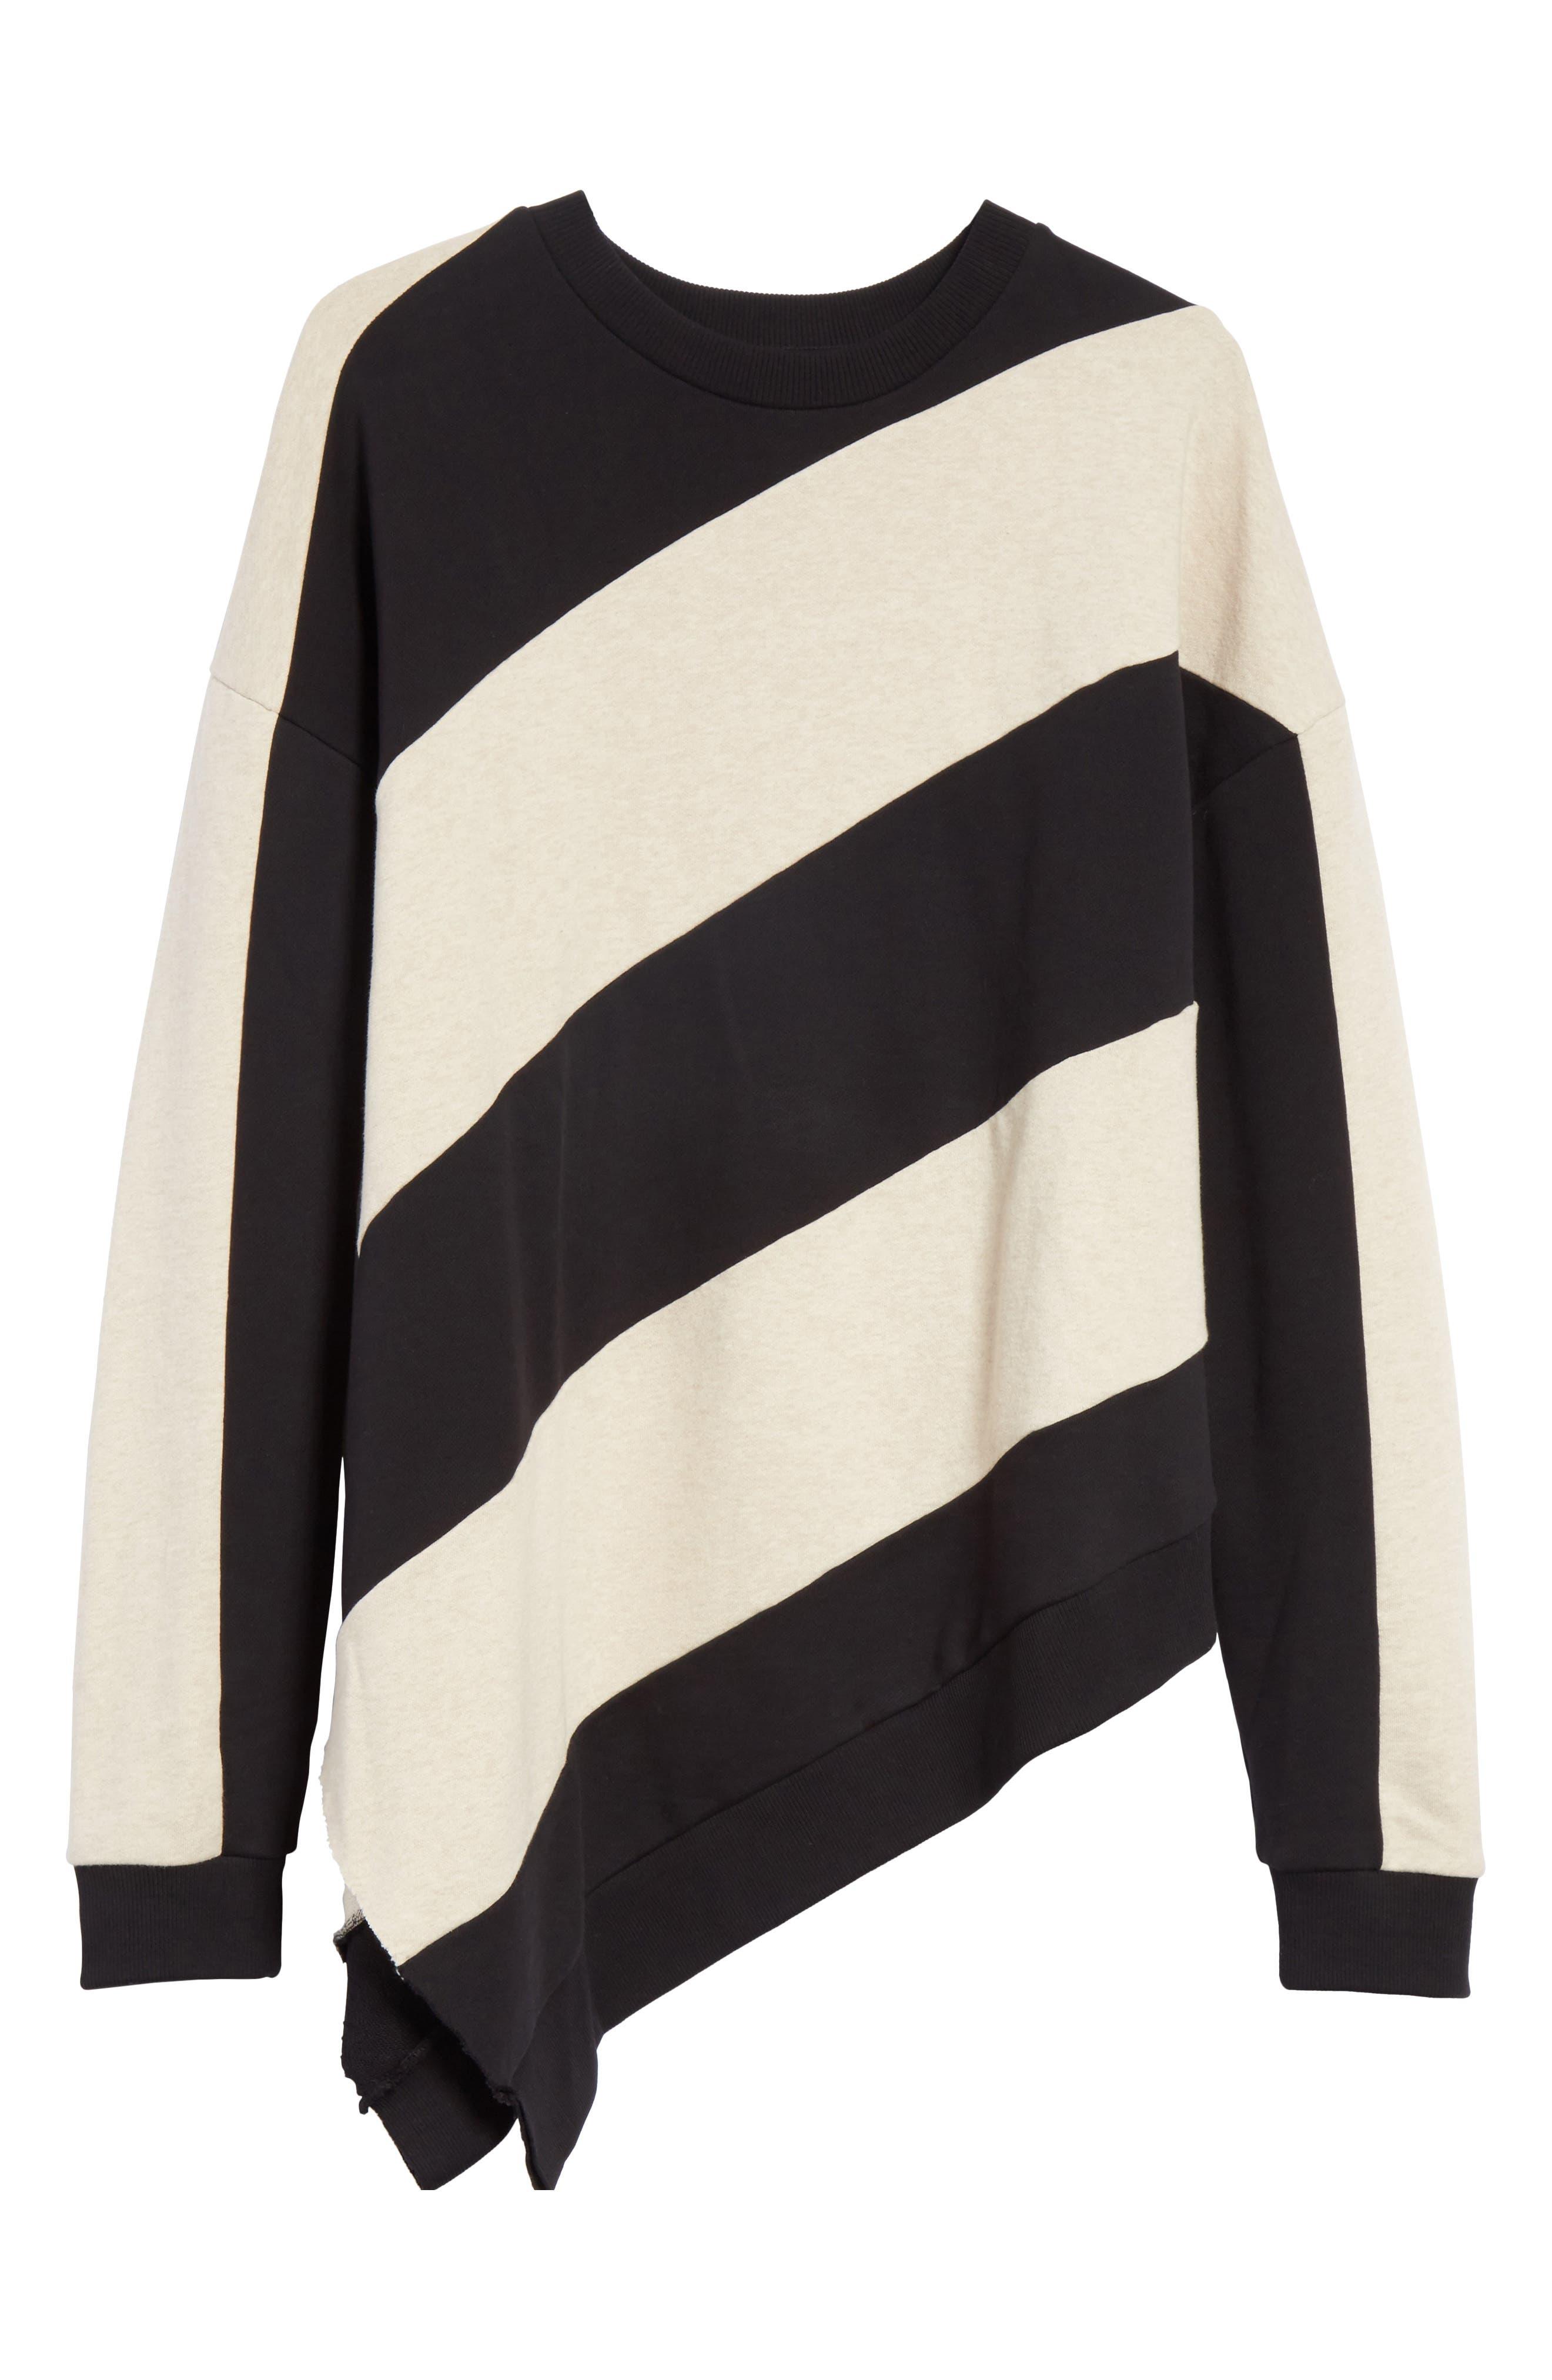 Marques'Almeida Asymmetrical Stripe Sweatshirt,                             Alternate thumbnail 6, color,                             250